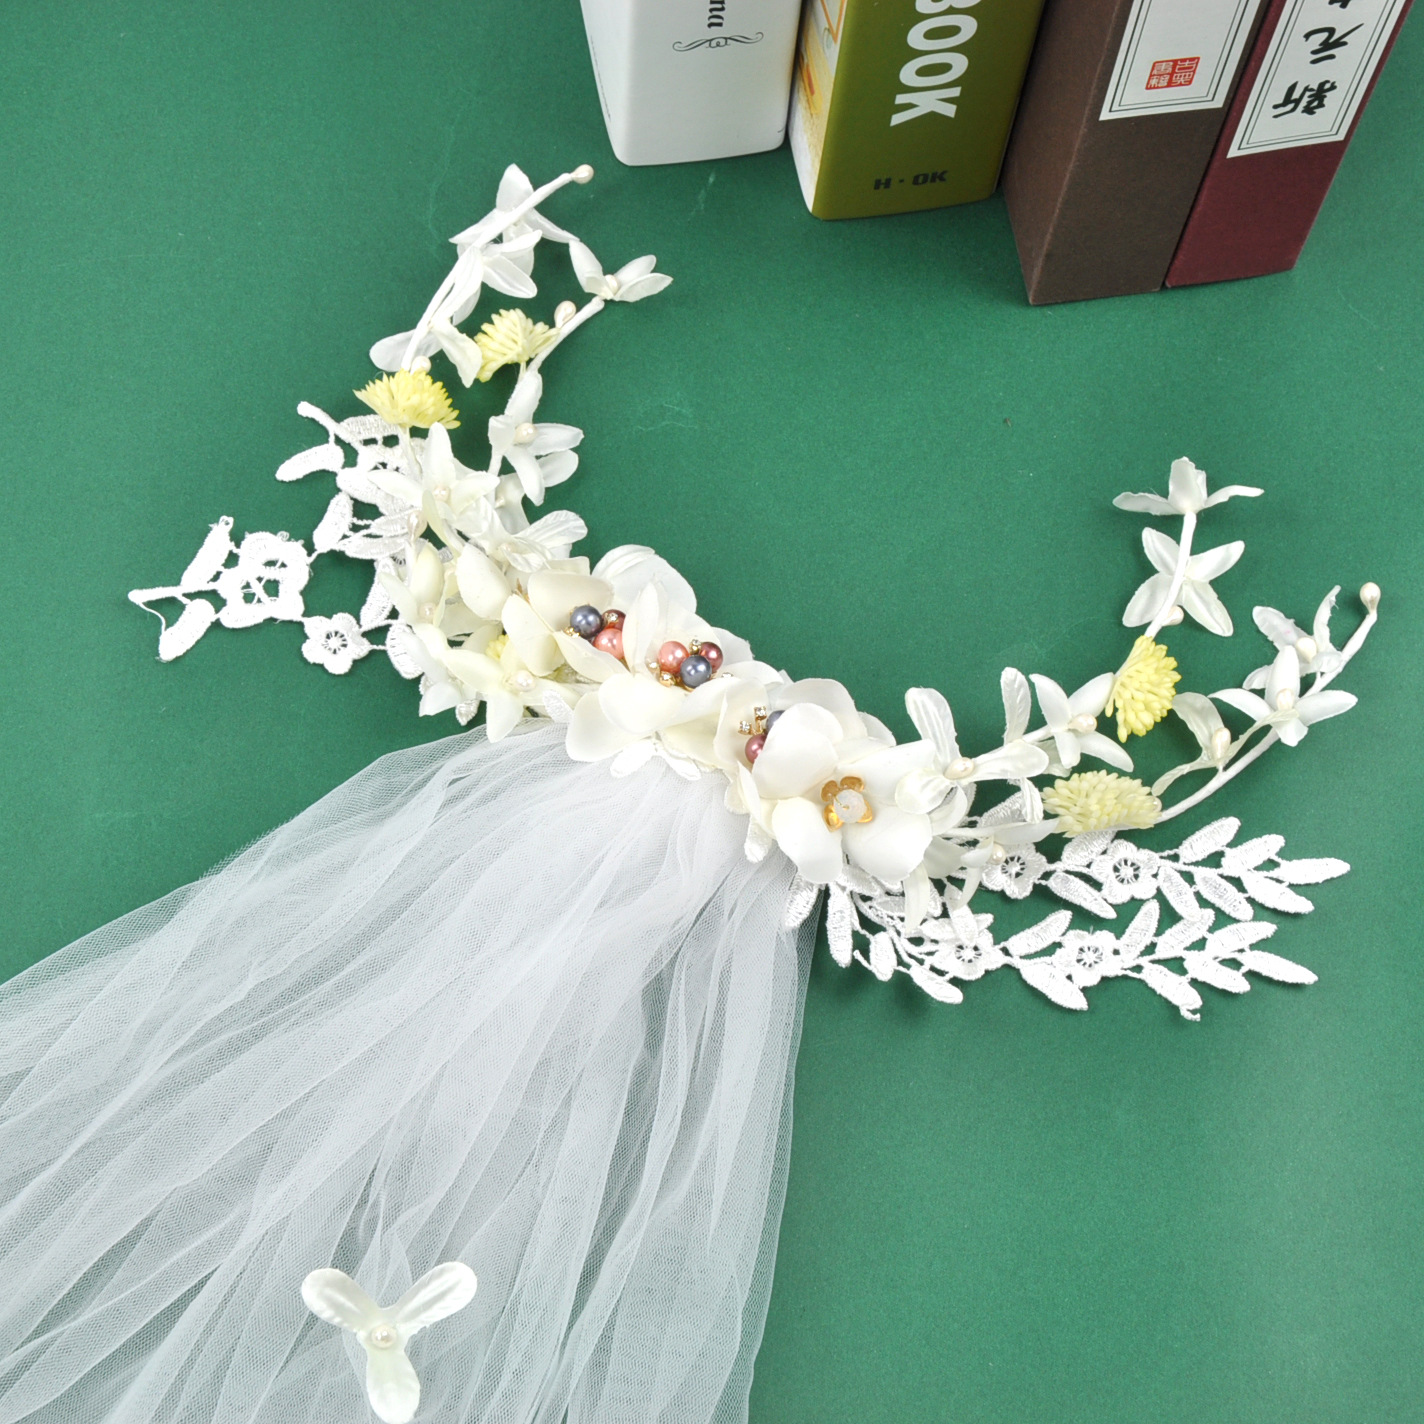 manwiisweet santos novia guirnalda cabeza salsa blanca cabeza accesorios para el cabello flor hecha a mano